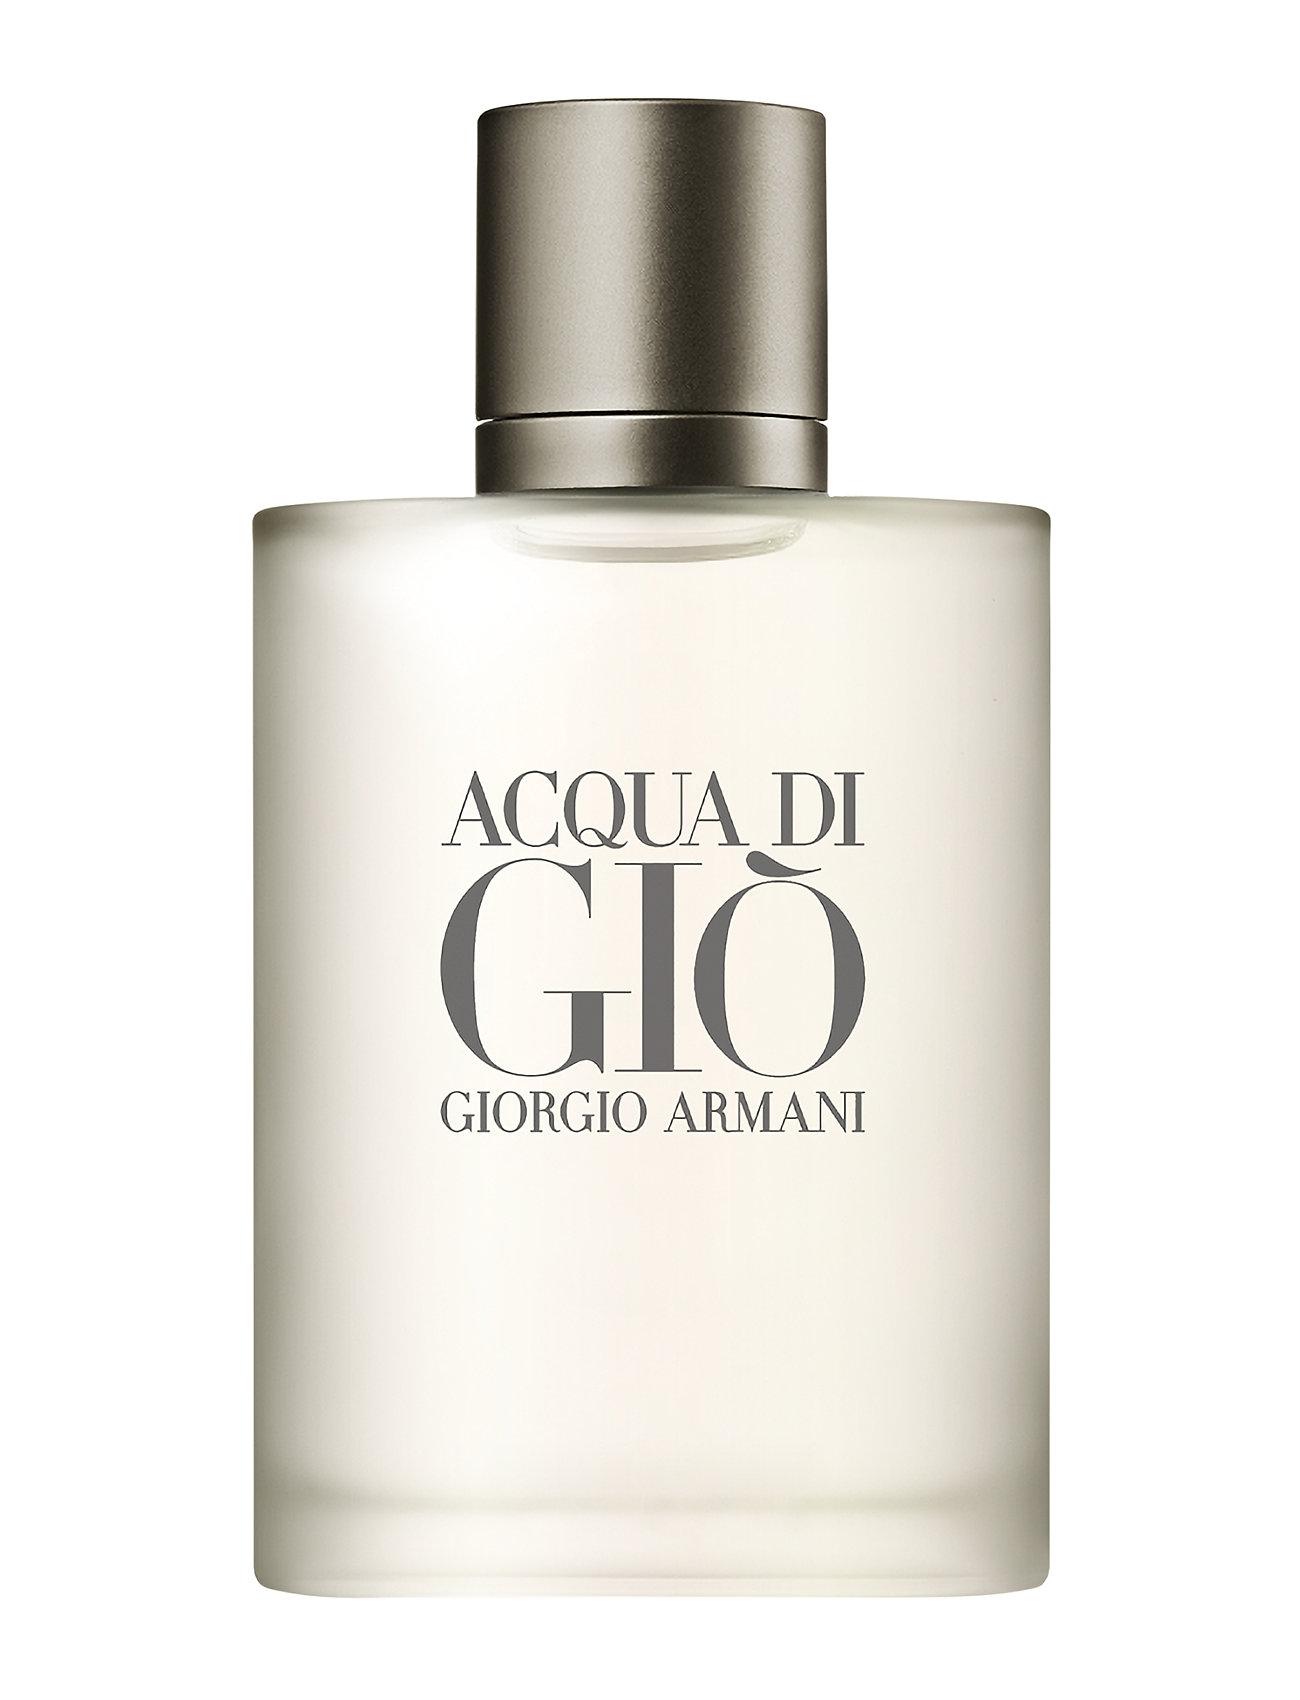 giorgio armani – Acqua di giã² pour homme eau de toilette 30 ml fra boozt.com dk